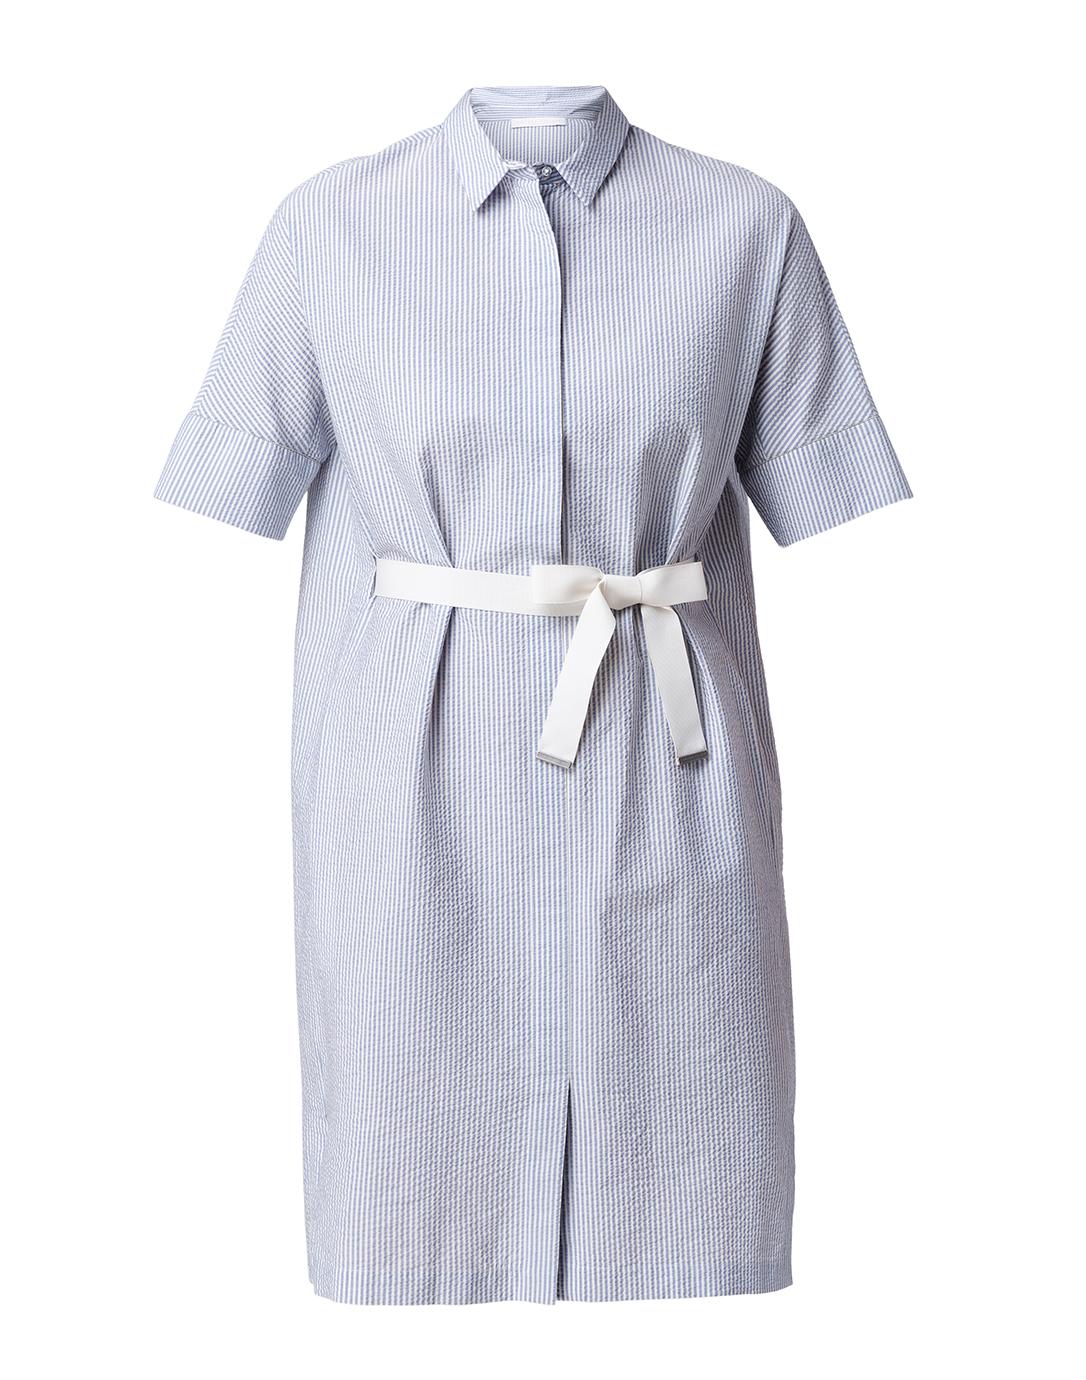 Blue And White Seersucker Shirt Dress Fabiana Filippi Halsbrook